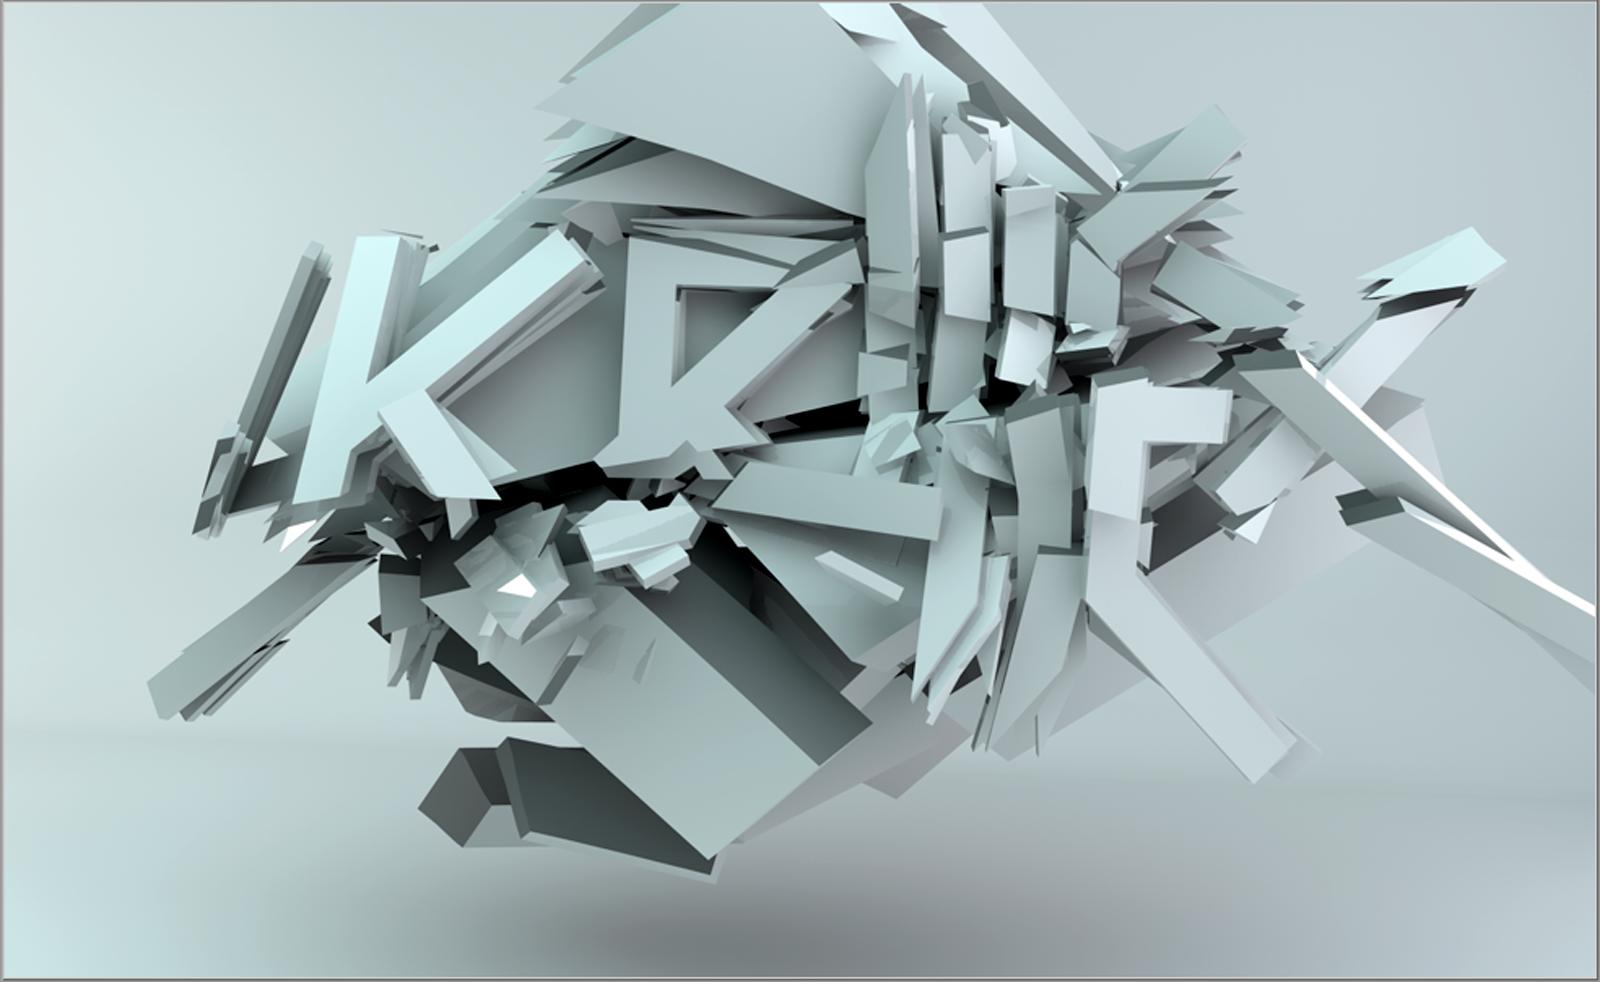 http://1.bp.blogspot.com/-5aL-78KxFj4/UBXkhzcpIgI/AAAAAAAADNA/l71BZAHt6BU/s1600/Skrillex_Logo_3D_Text_HD_Wallpaper-Vvallpaper.Net.png